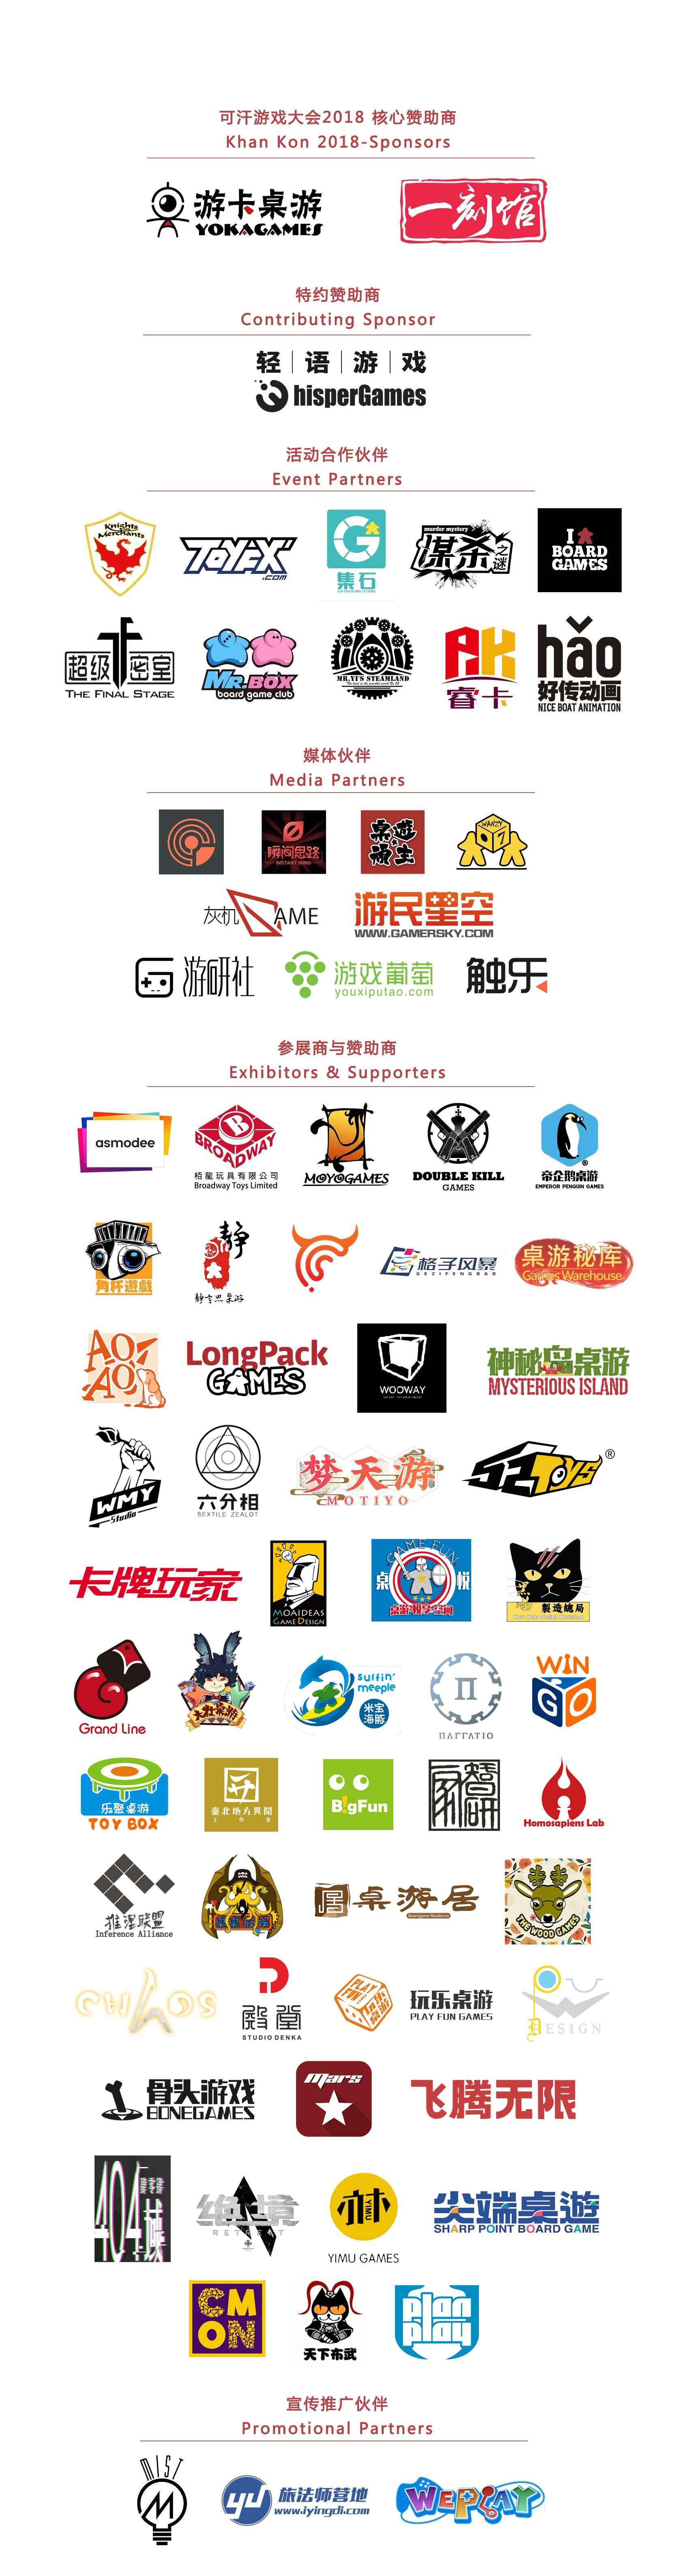 logo墙-under 3m.jpg